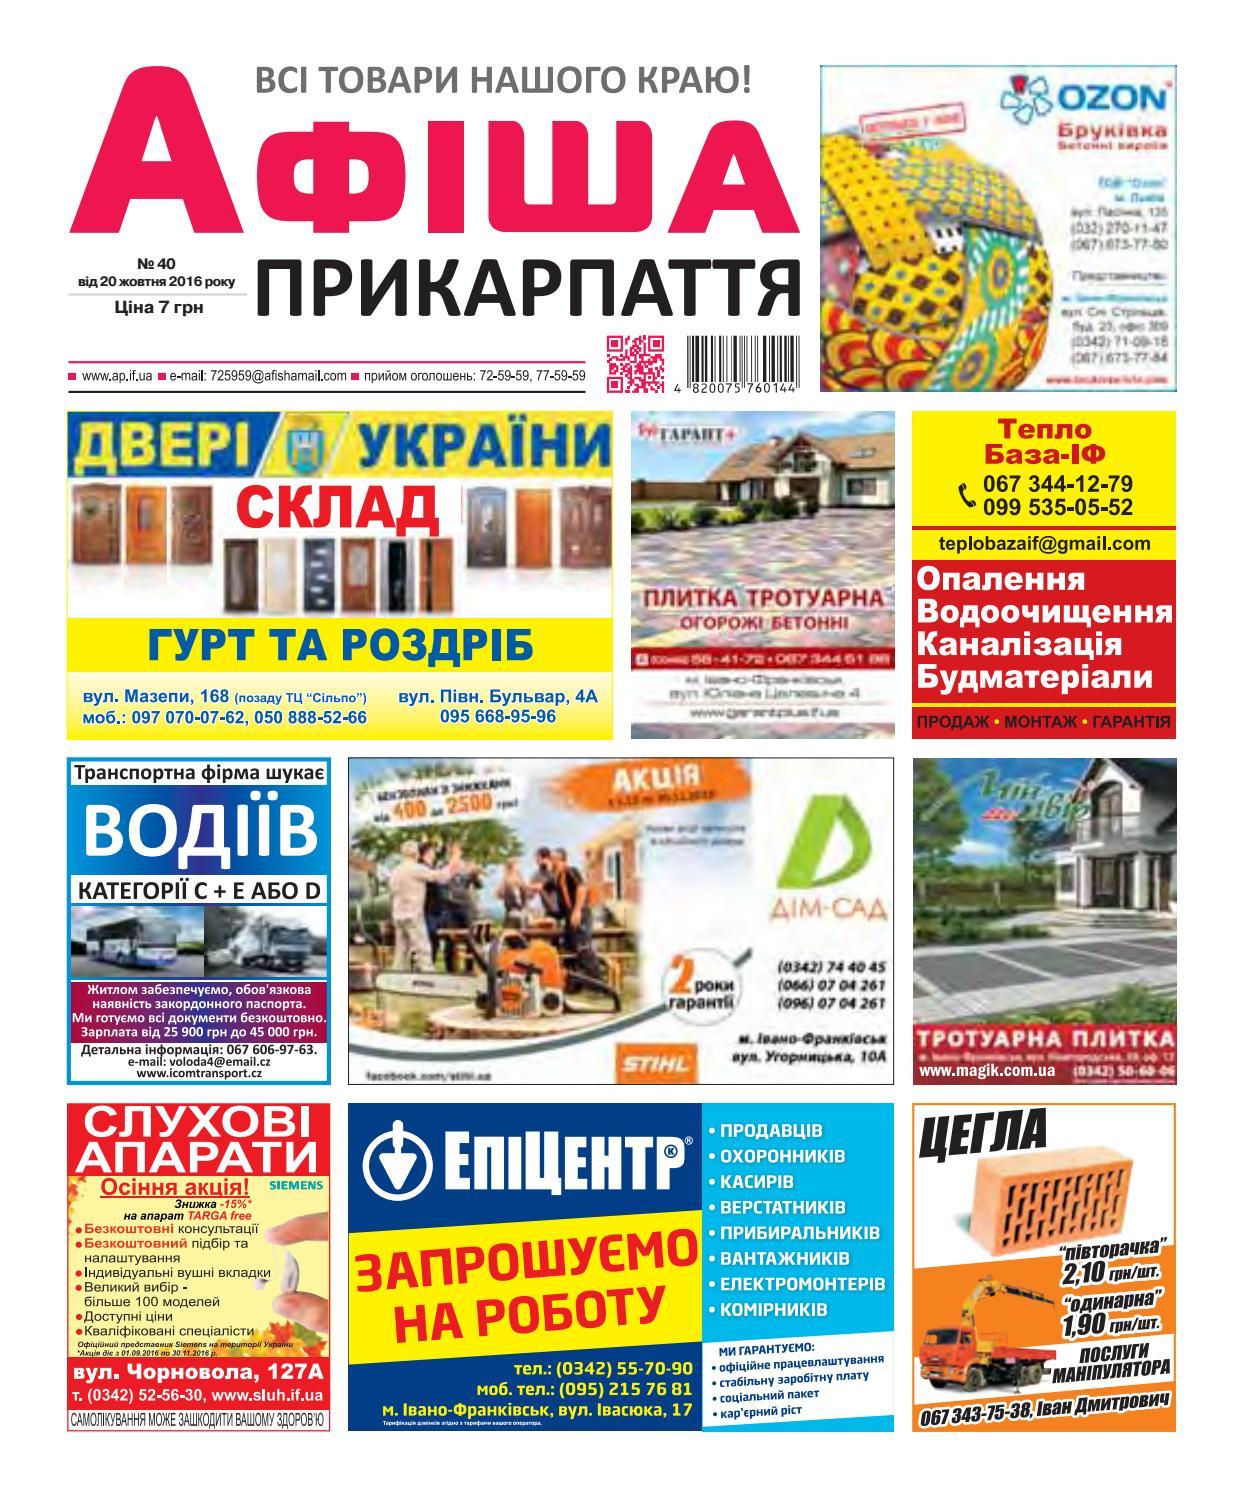 Афіша Прикарпаття №40 by Olya Olya - issuu 1d2b76d2d0ddc